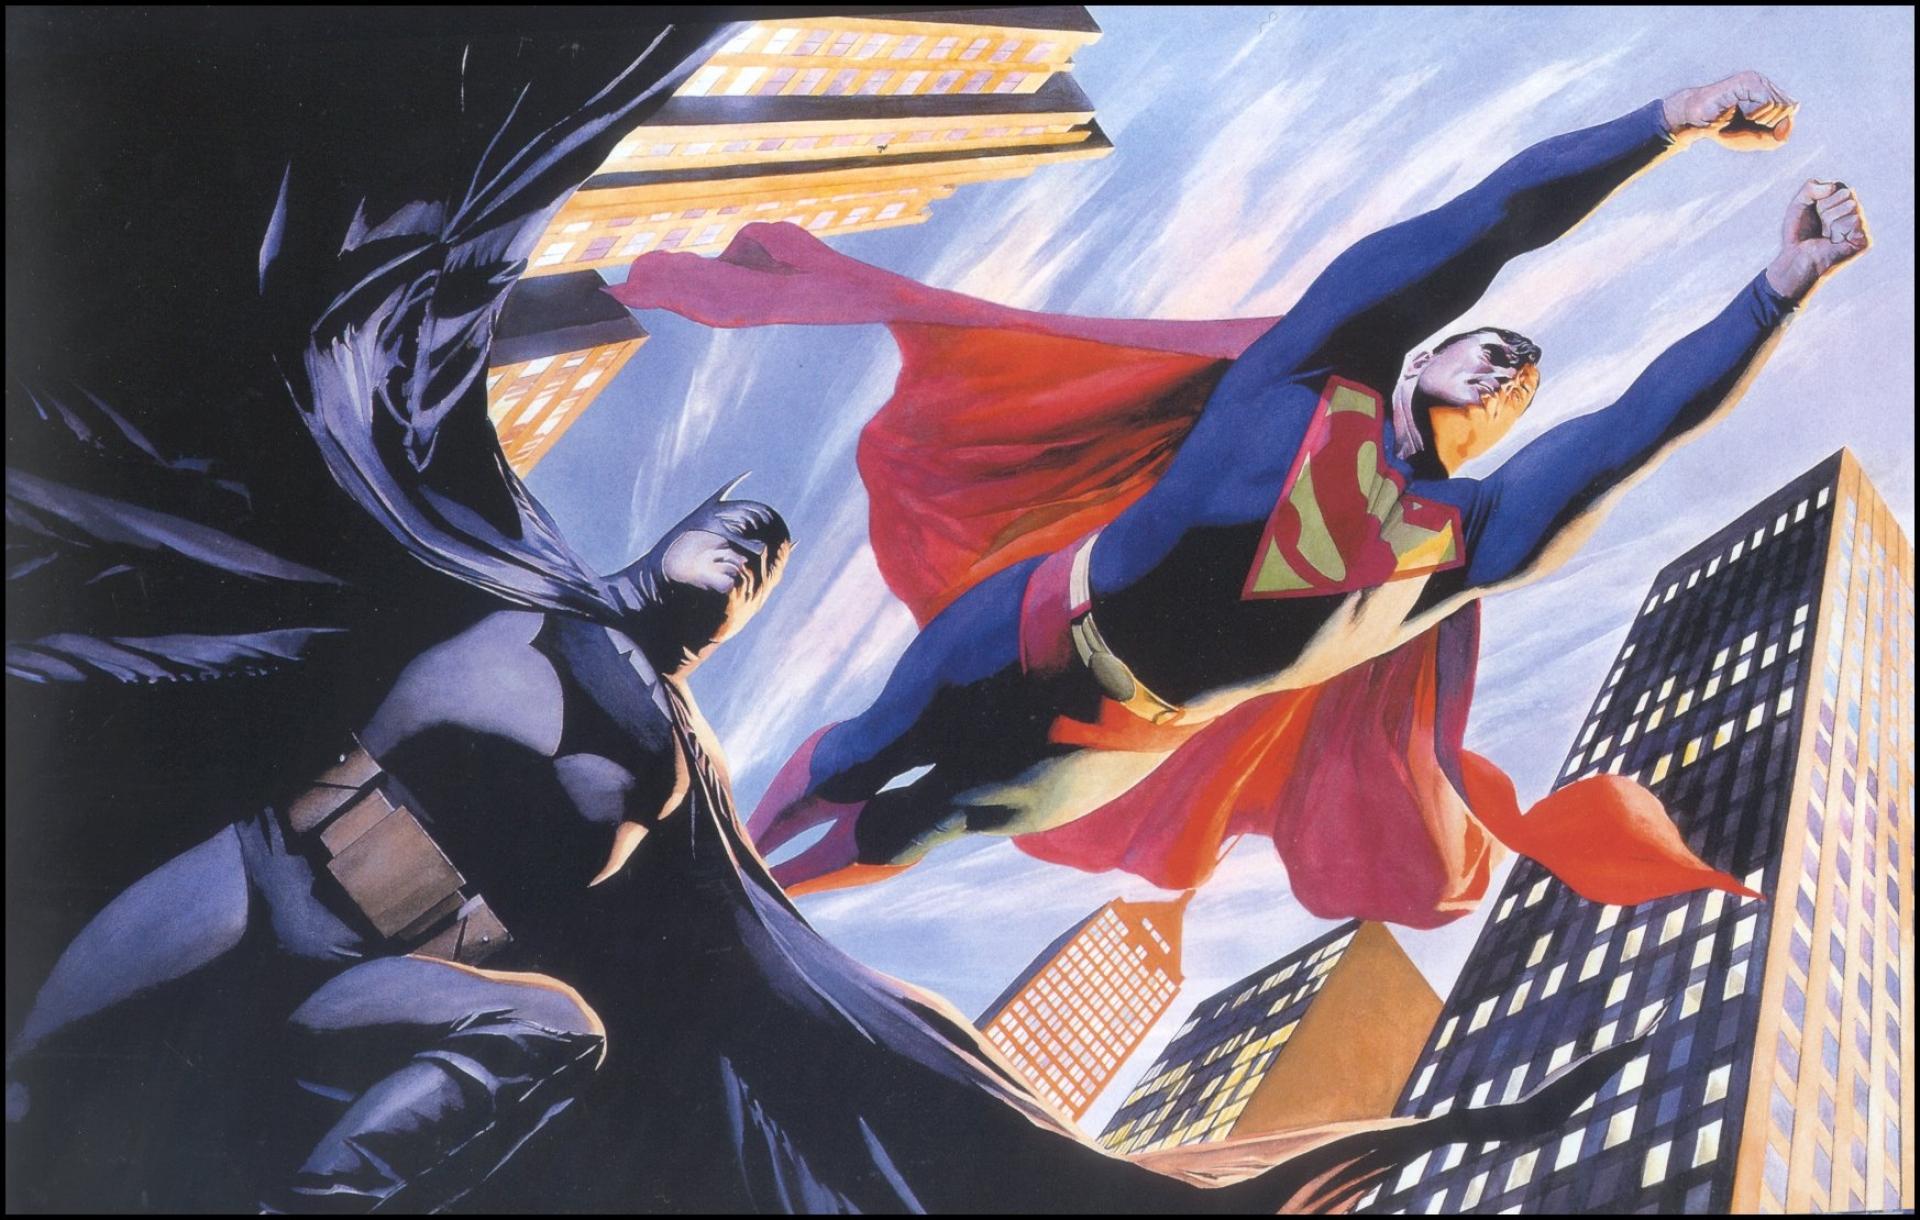 Batman And Superman Wallpaper Background HD Download Wallpapers 1920x1220